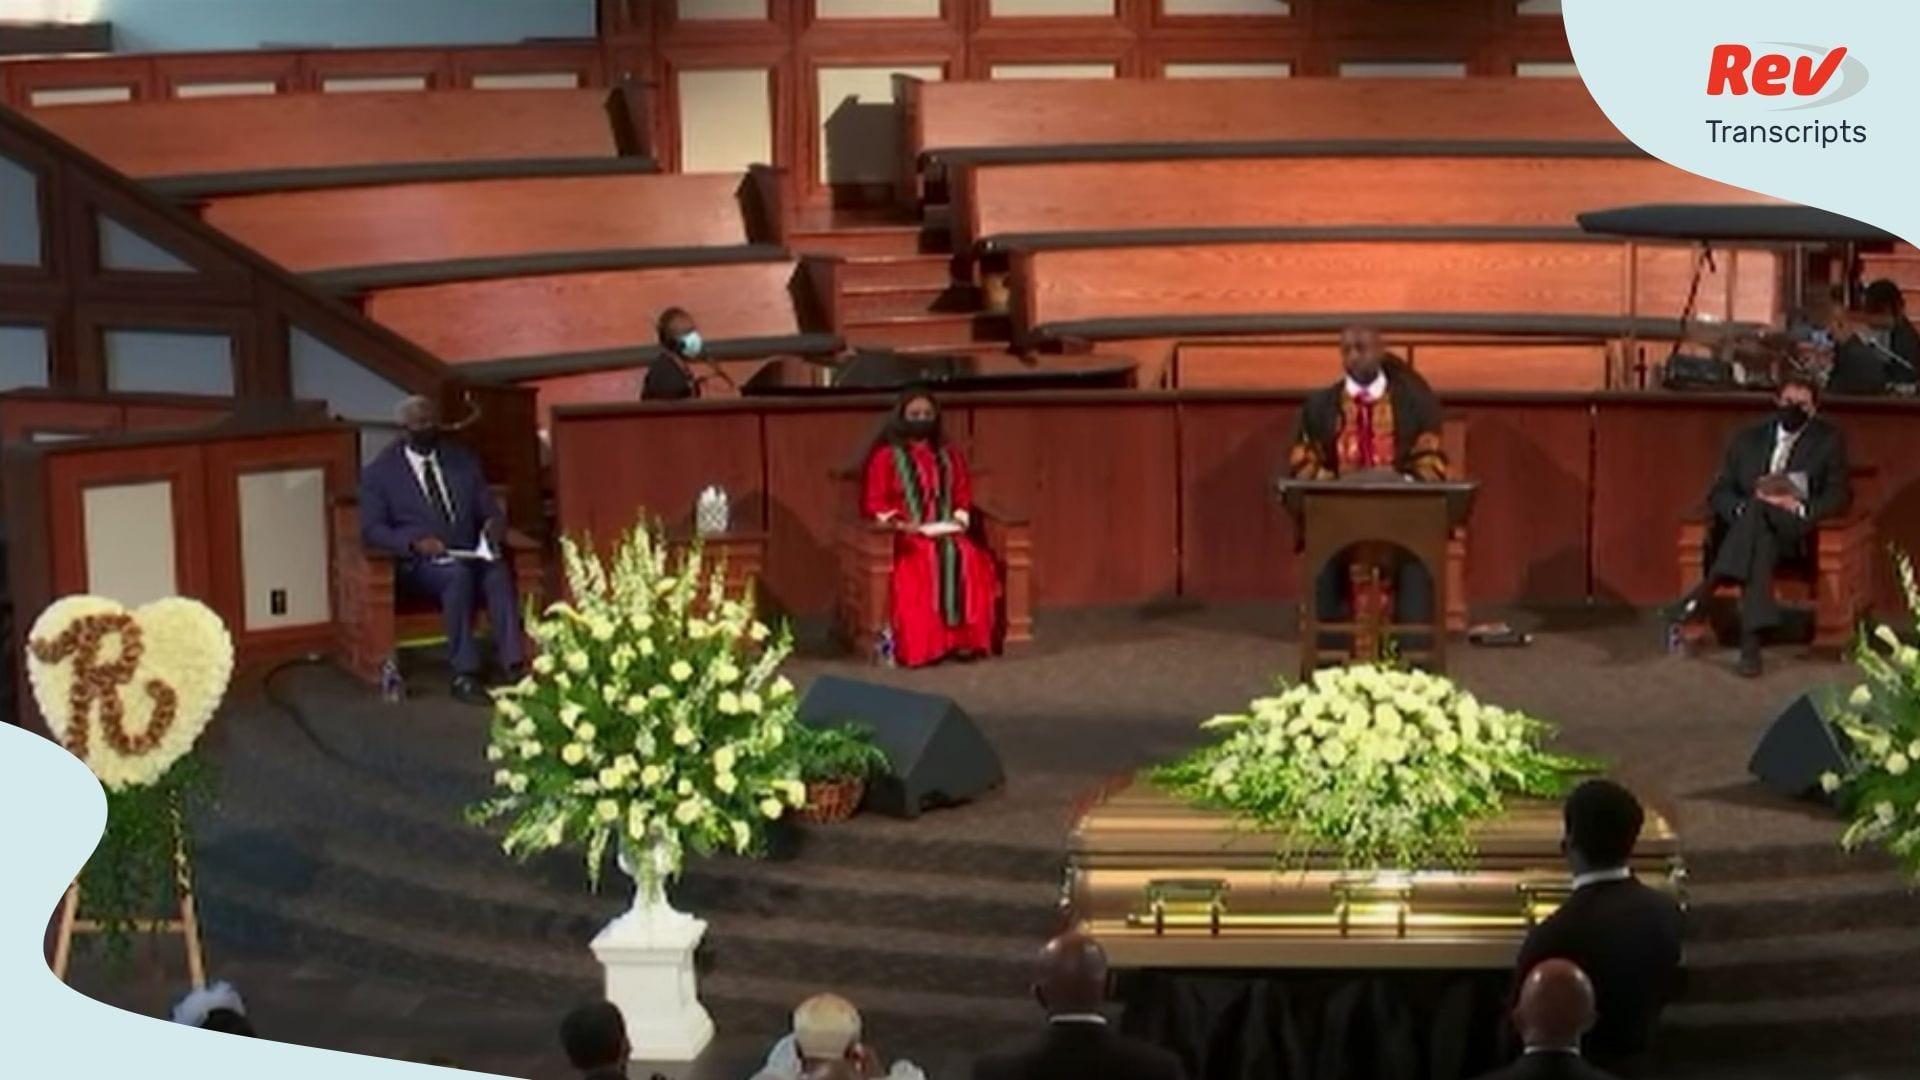 Rayshard Brooks Funeral & Eulogy Transcripts